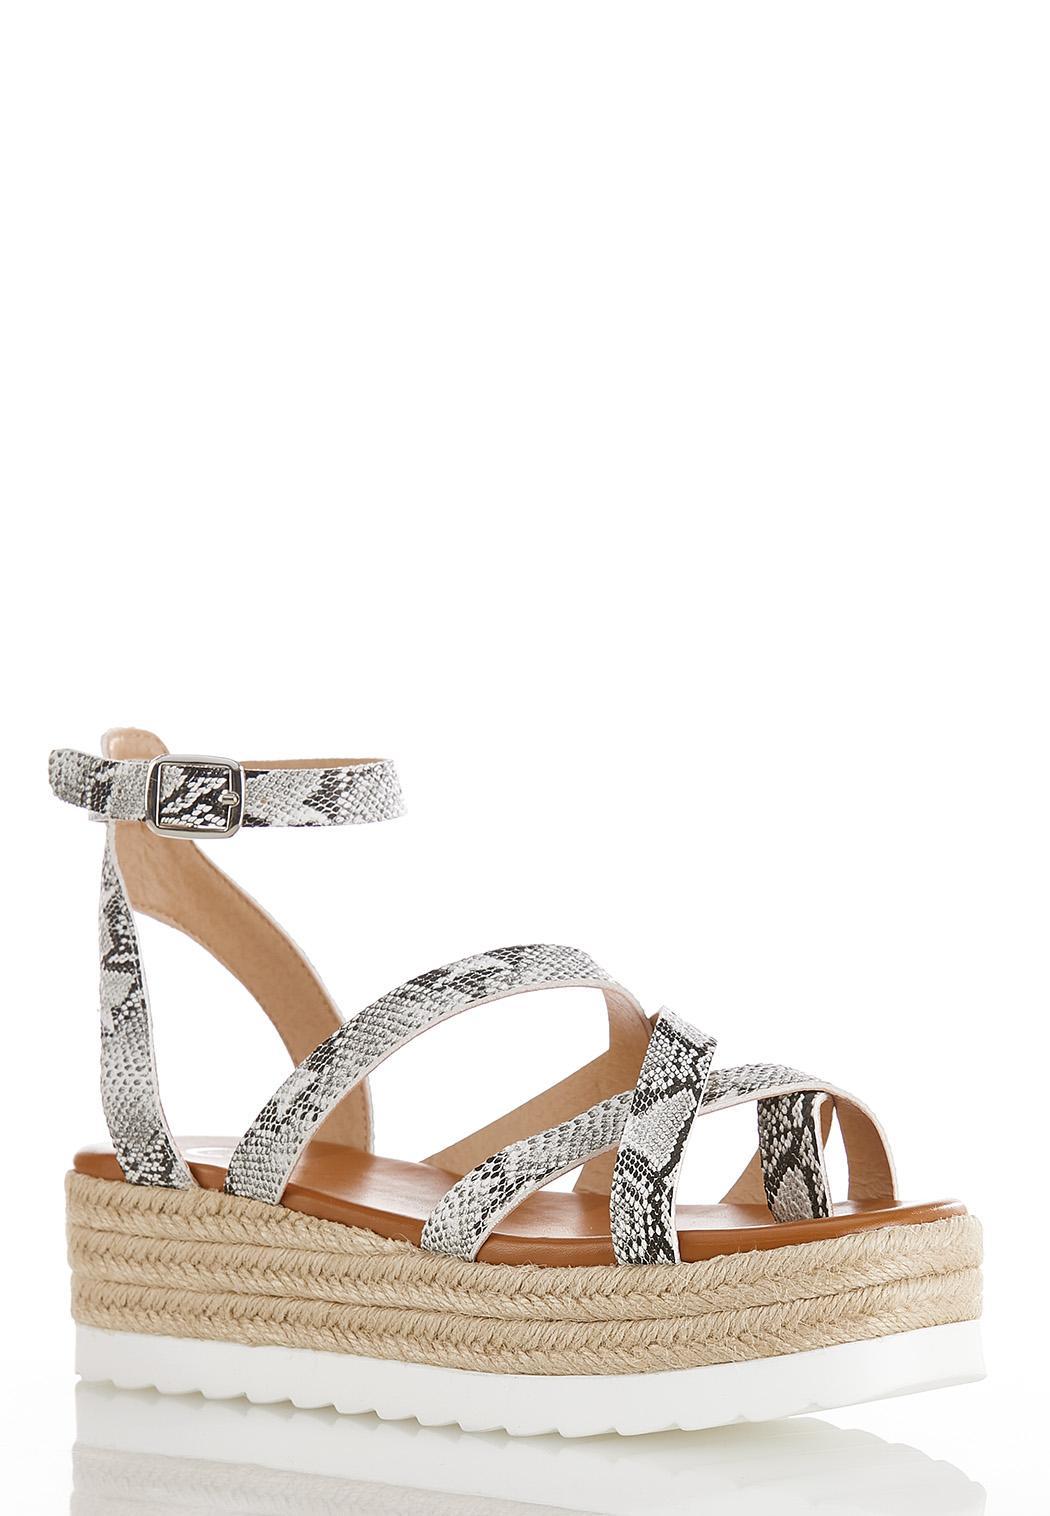 Strappy Snakeskin Flatform Sandals